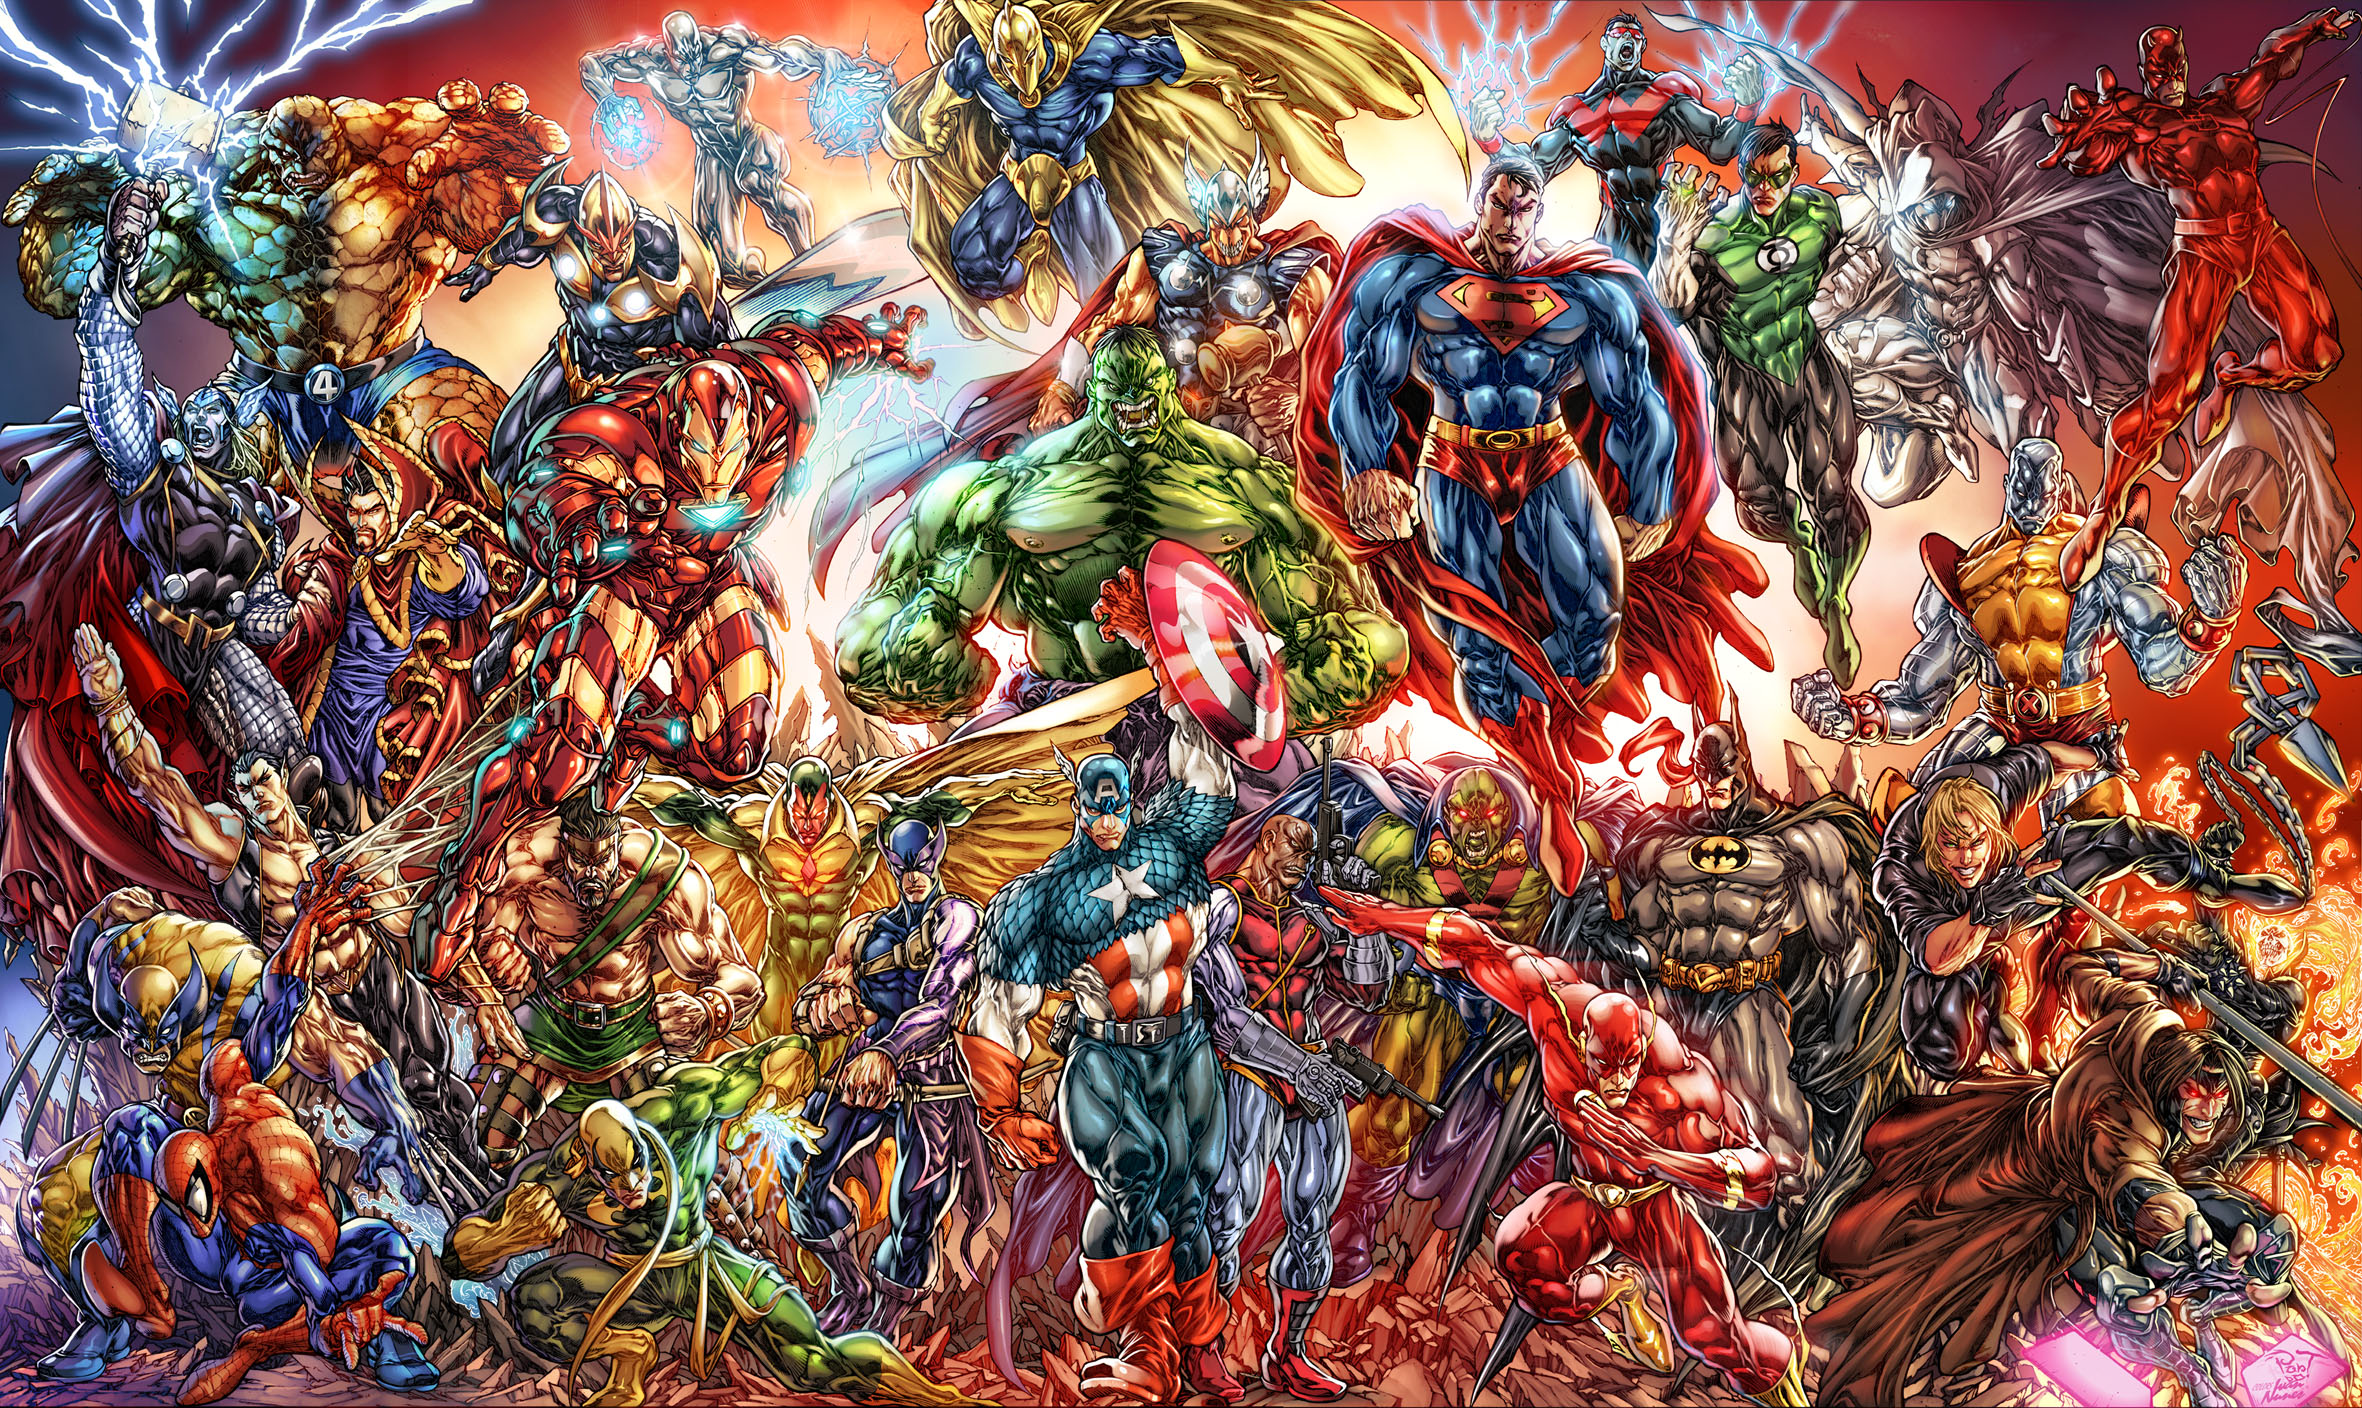 Batman Ben Grimm Beta Ray Bill Captain America Colossus Dc Comics Daredevil Deathlok Doctor Fate Doc 2362x1408